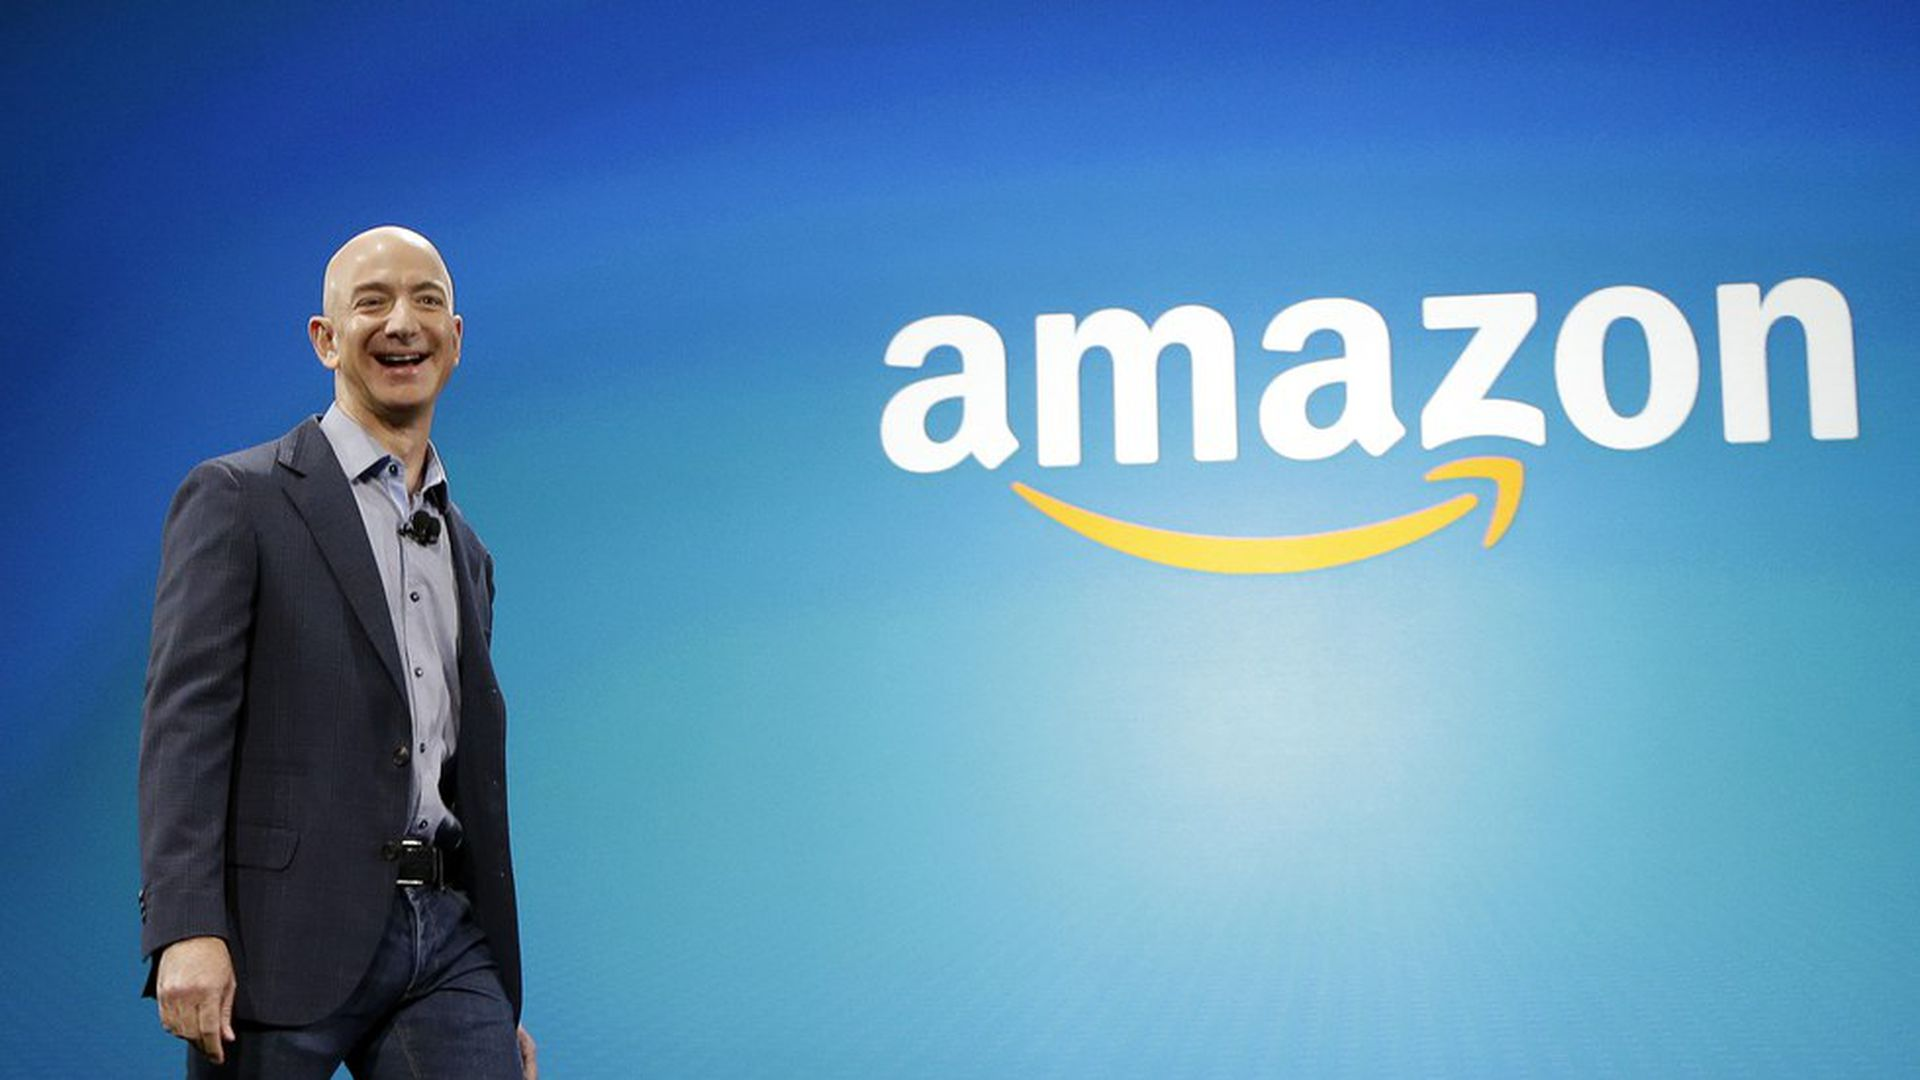 Jeff Bezos passes Bill Gates as world's richest man - Axios